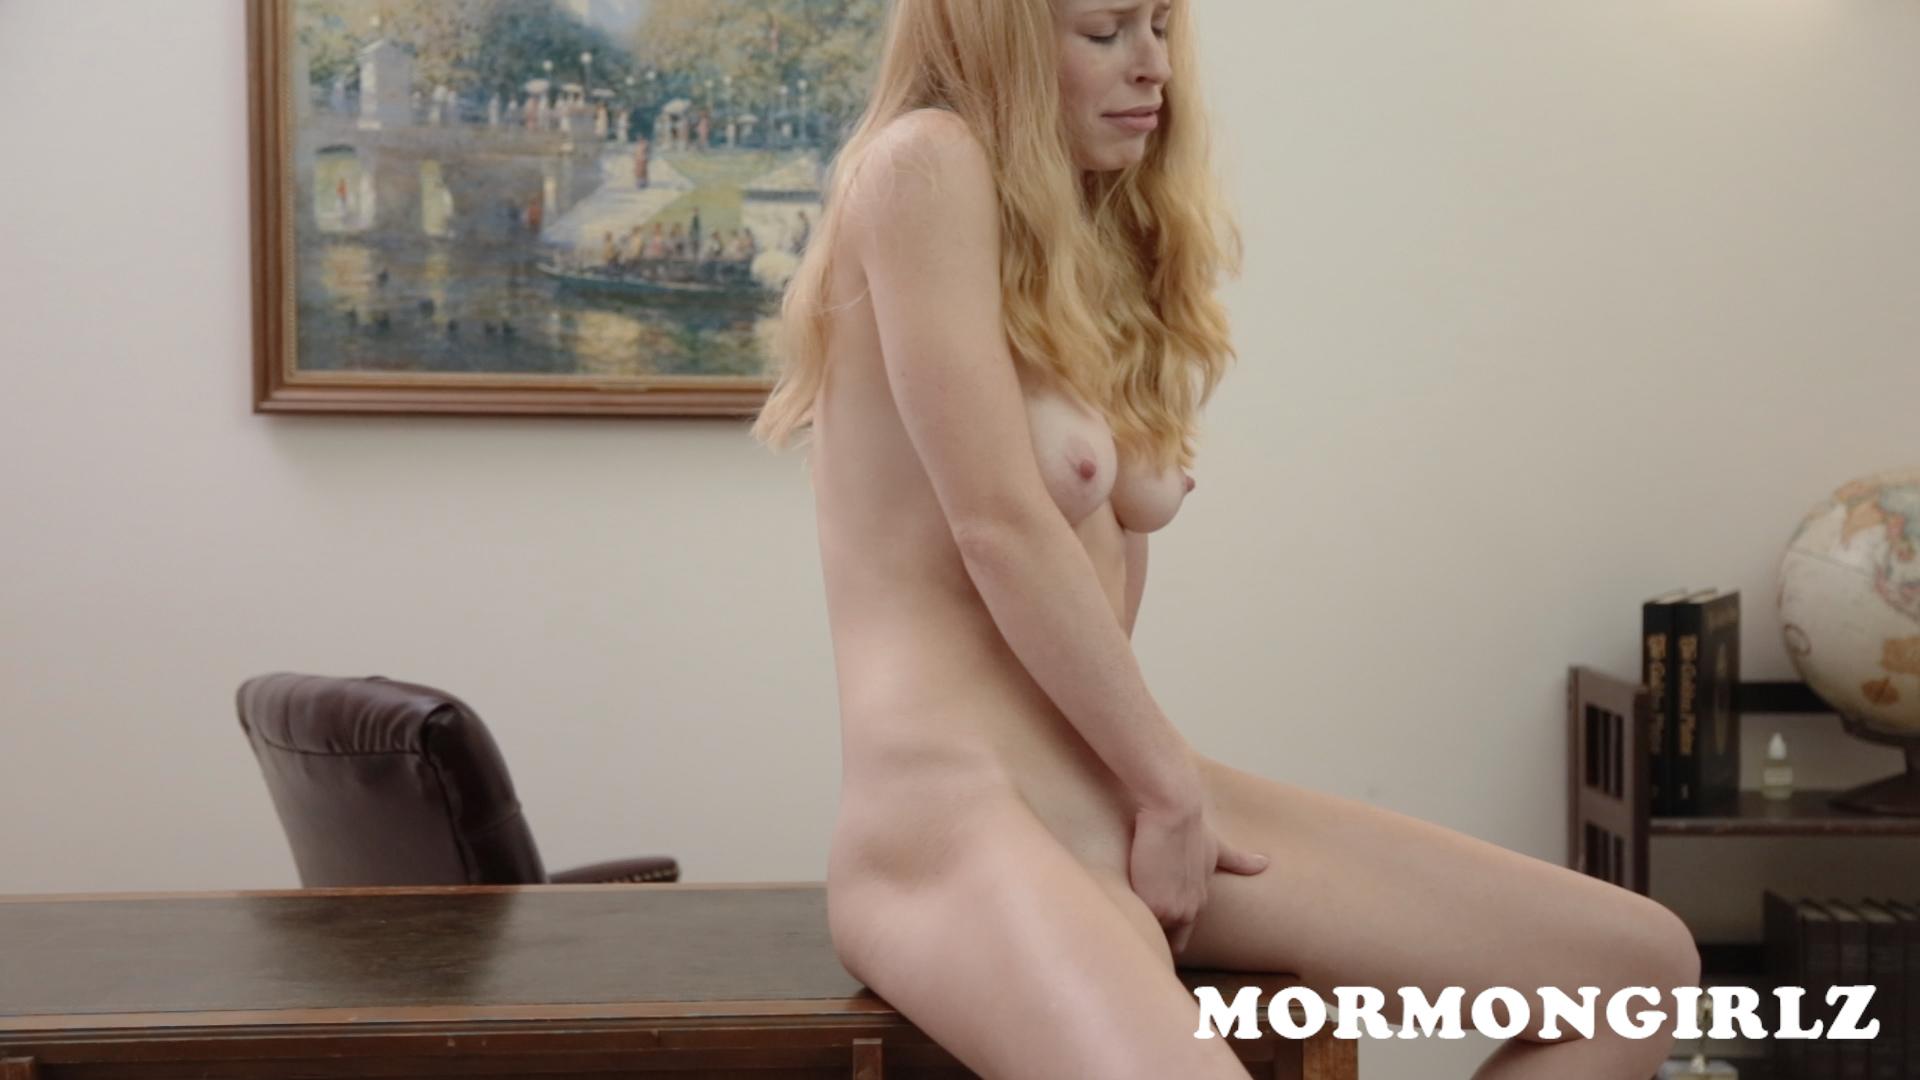 mormongirlz_70b_15